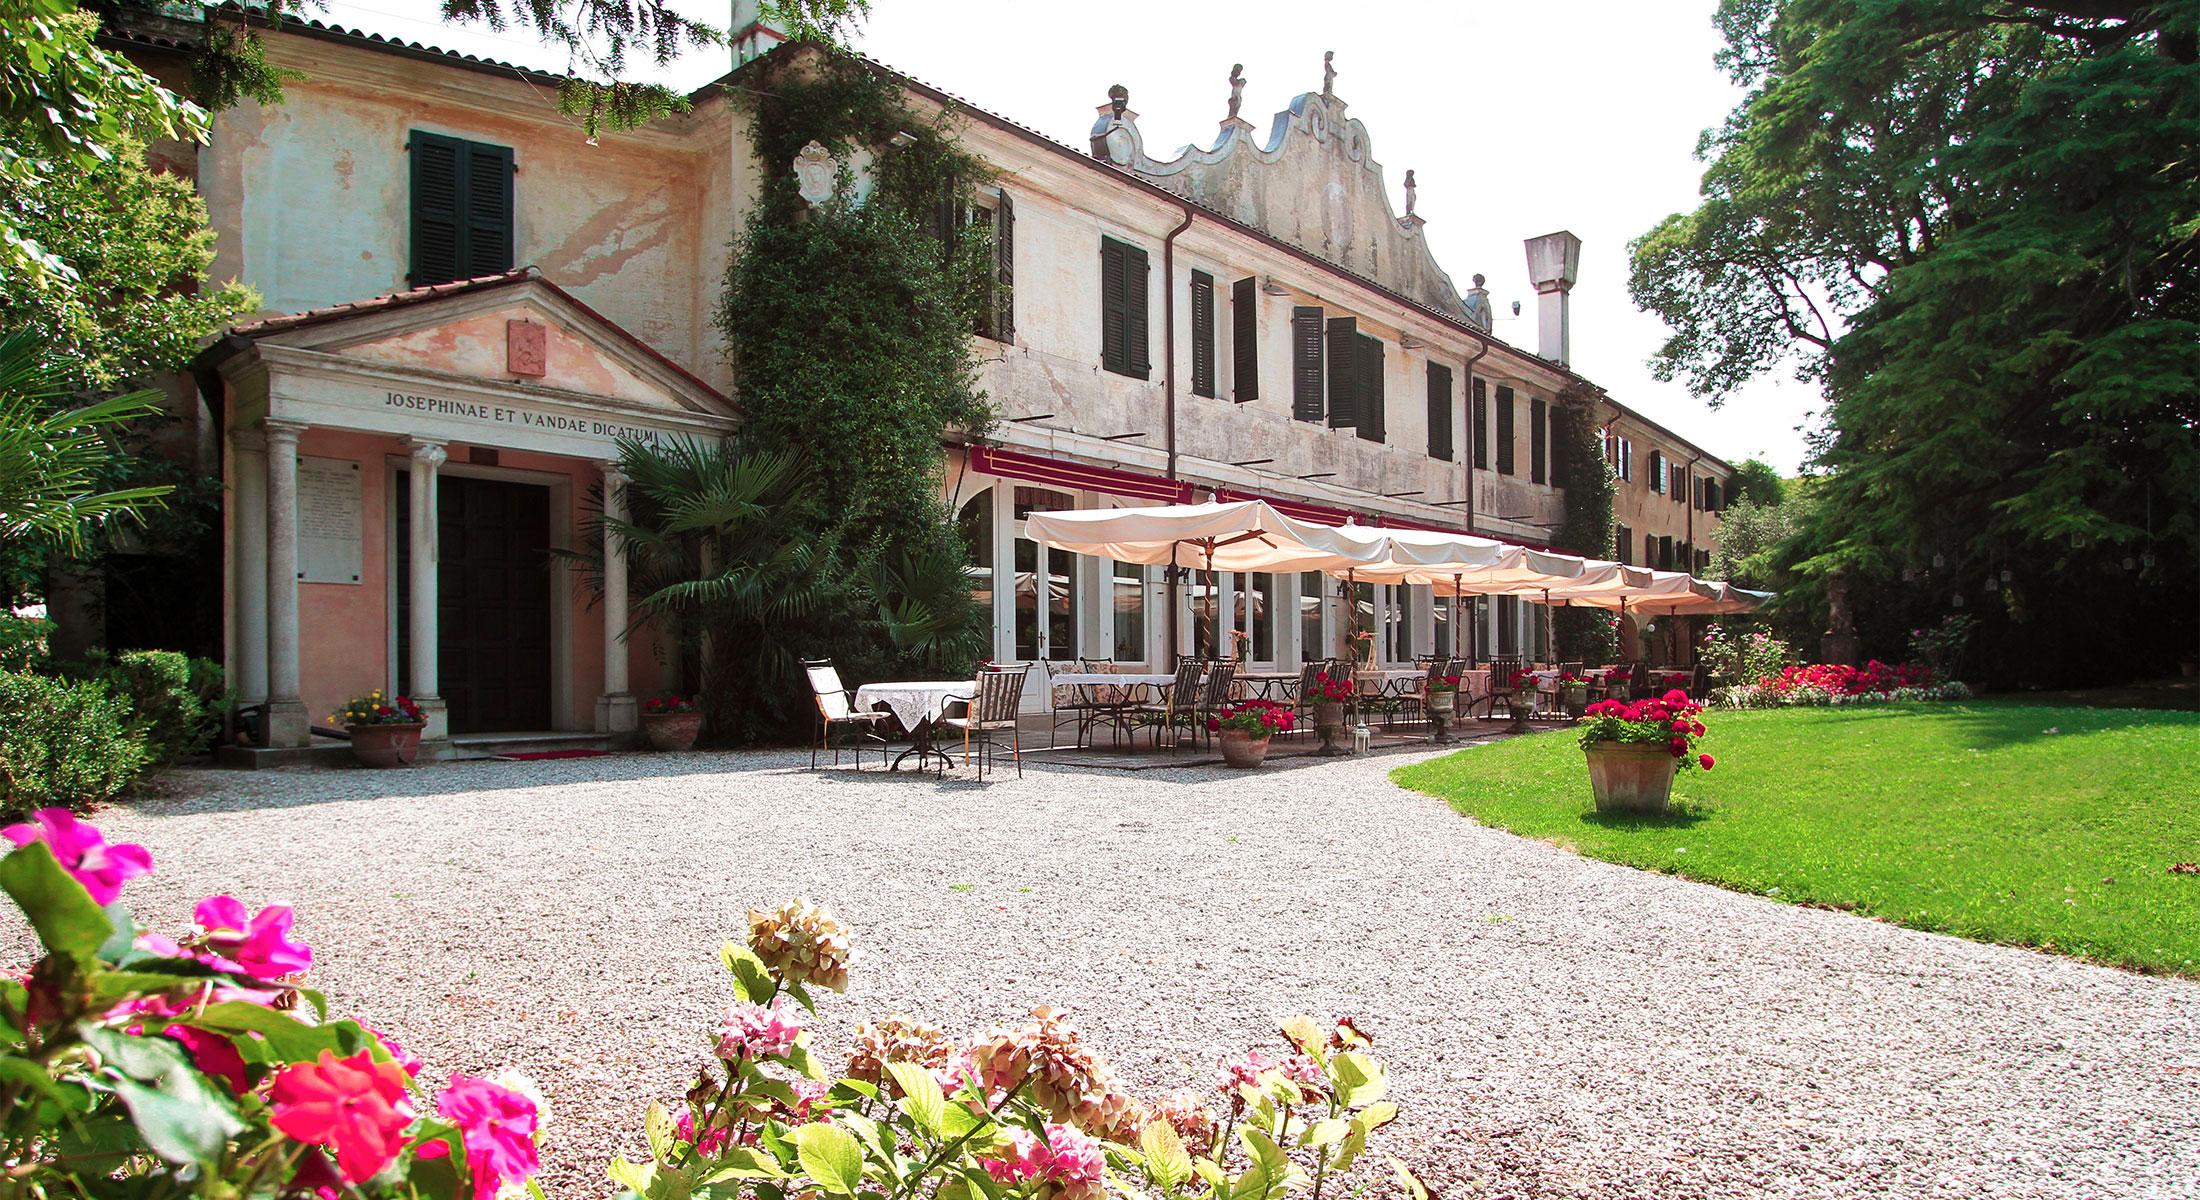 FRIULI VENEZIA GIULIA -    VILLA LUPPIS    HISTORIC HOUSE HOTEL